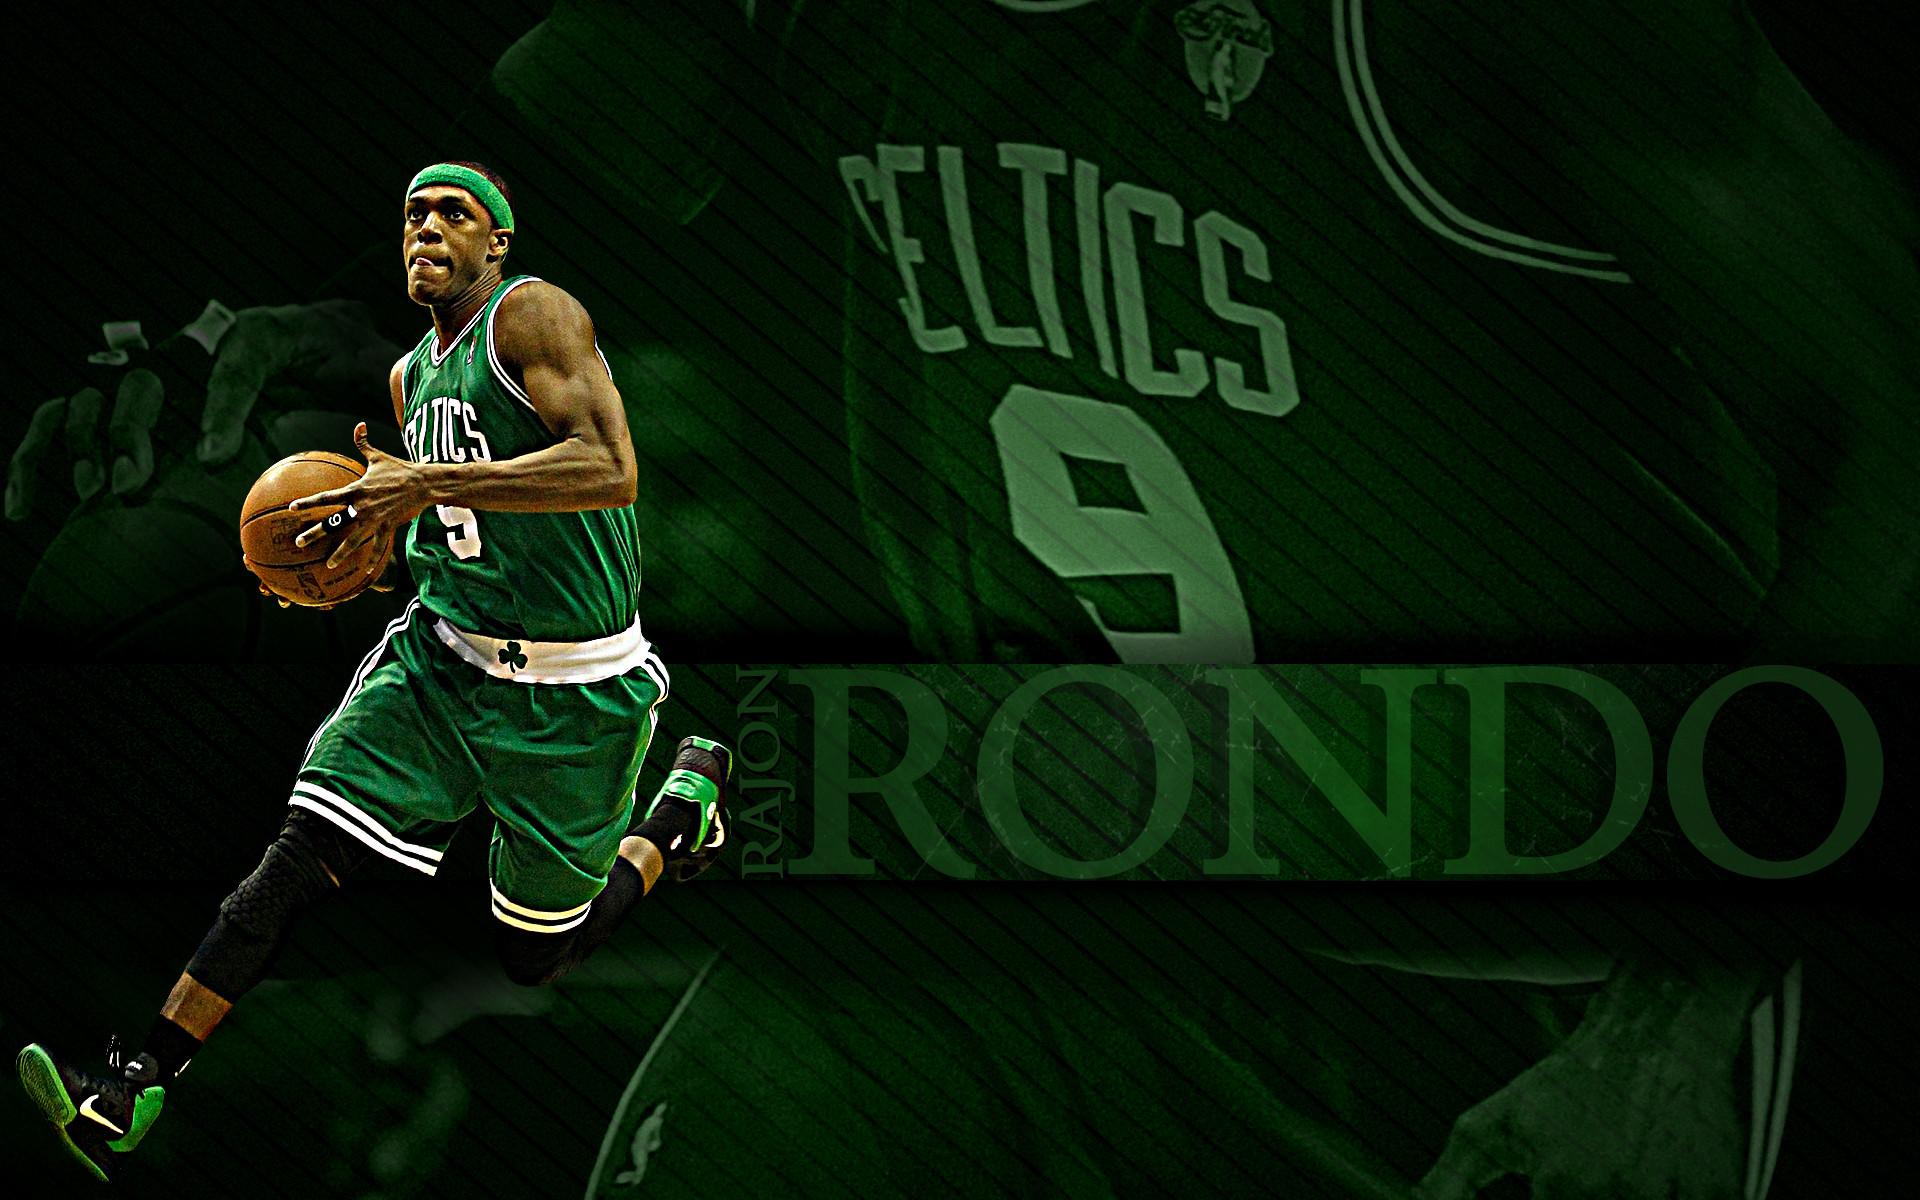 Rajon Rondo Wallpaper – Top PG, Center and Foundation of Boston Celtics!